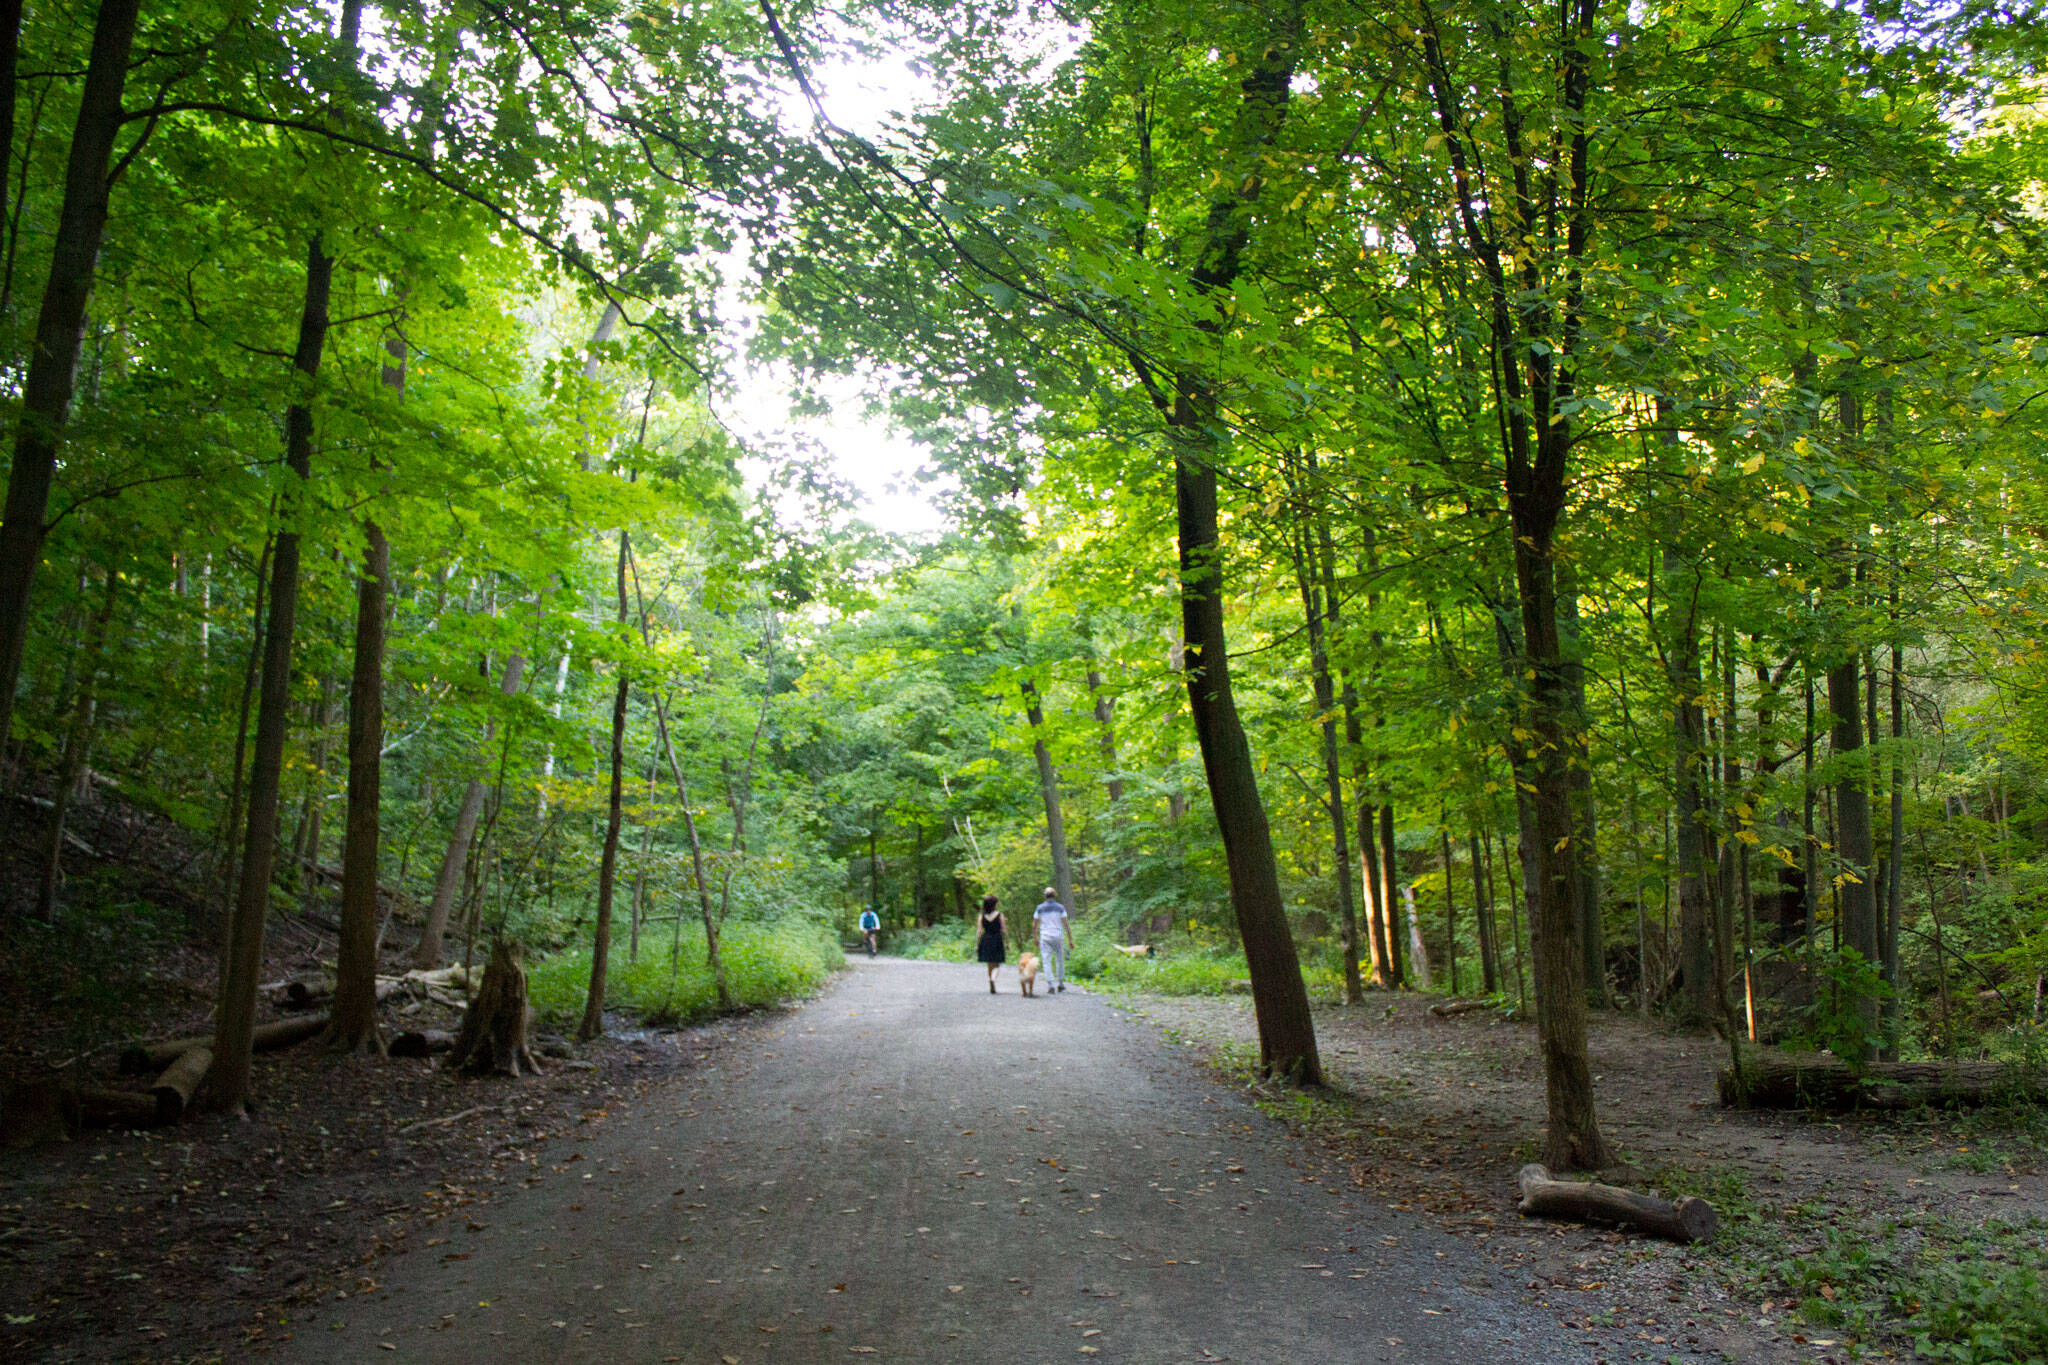 moore park ravine